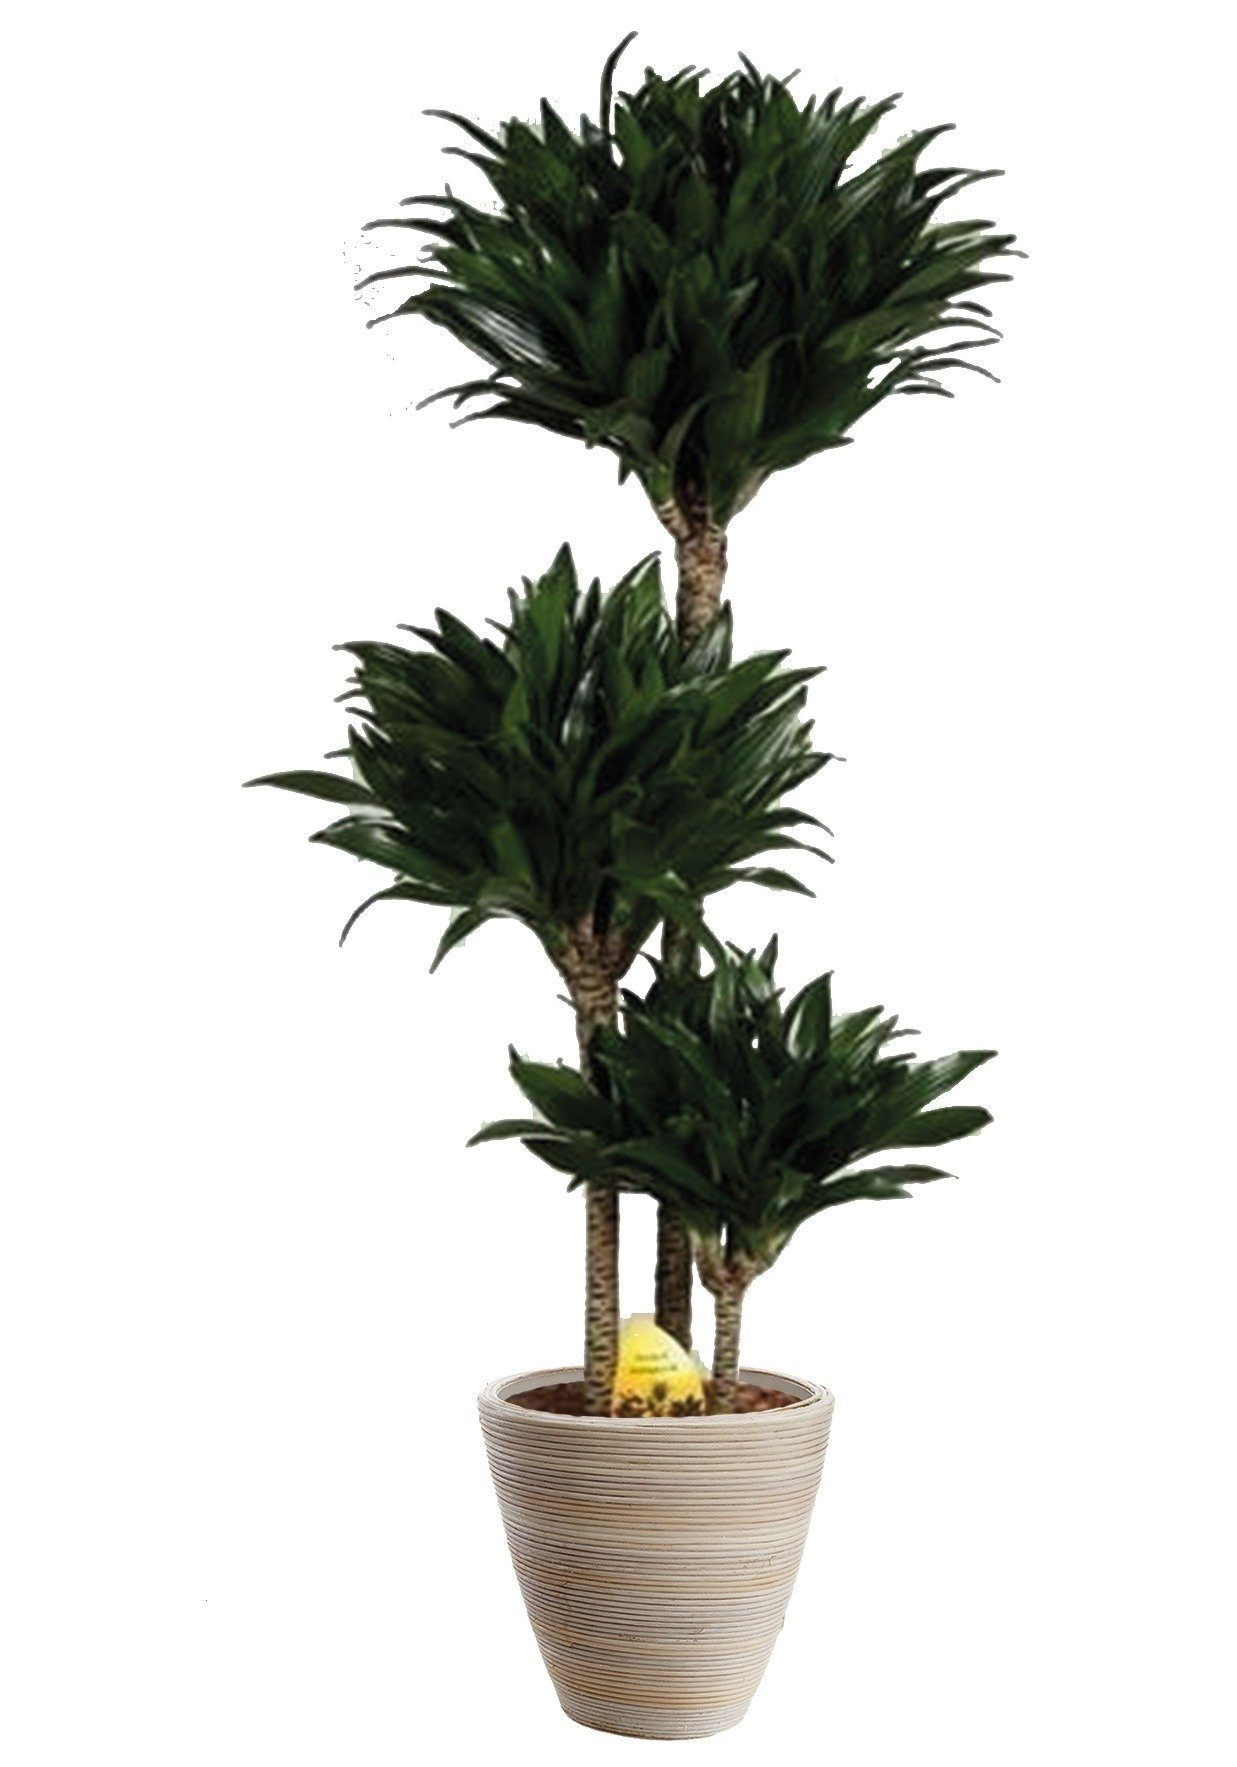 Zimmerpflanze »Drachenbaum Compacta«, 50 cm